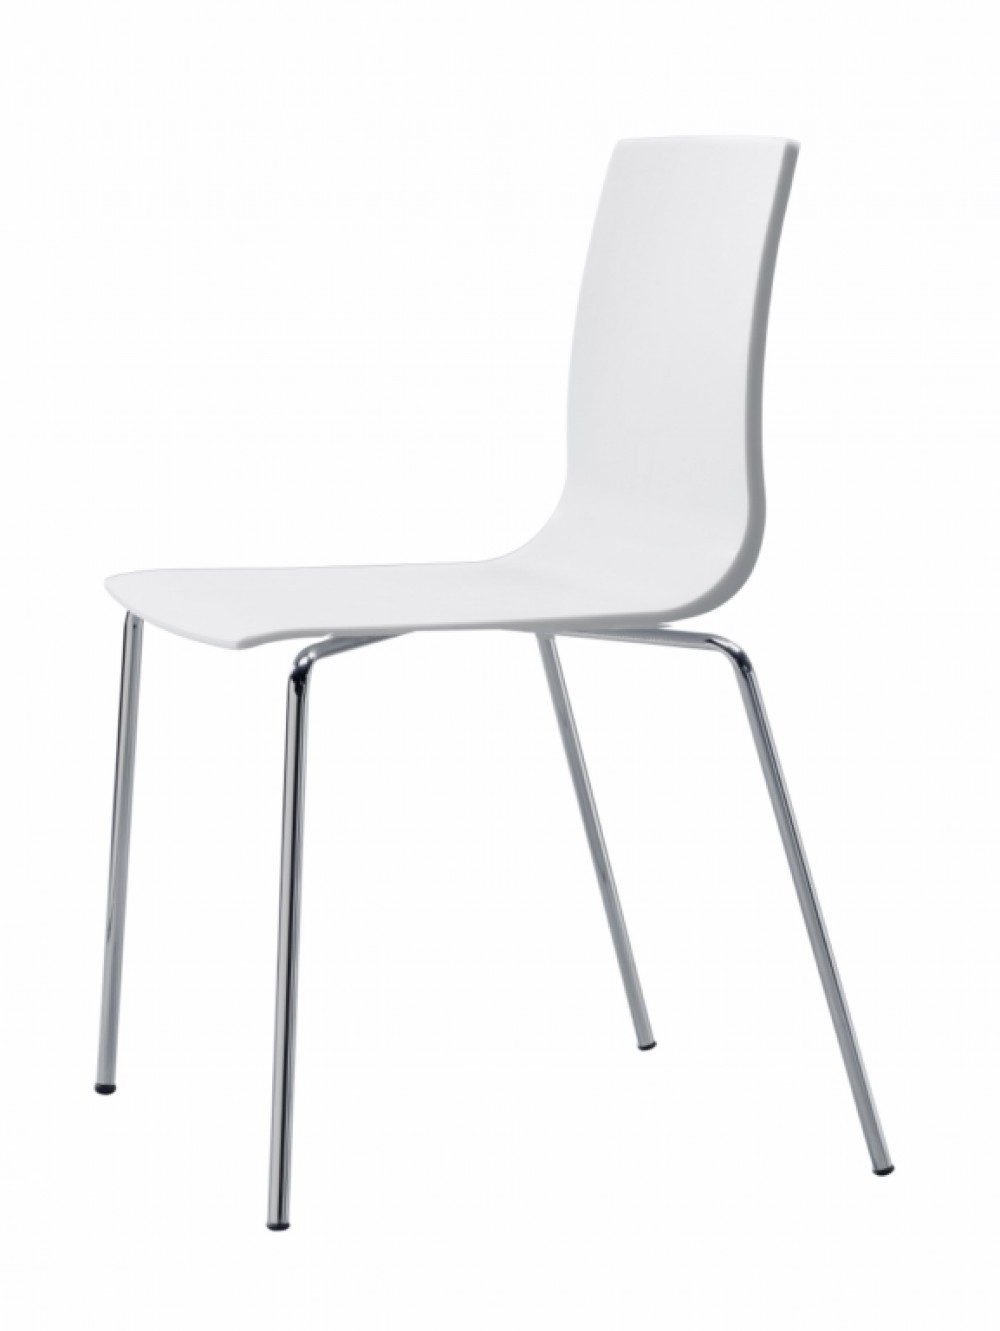 Design Stuhl weiß leinen, Stuhl stapelbar weiß